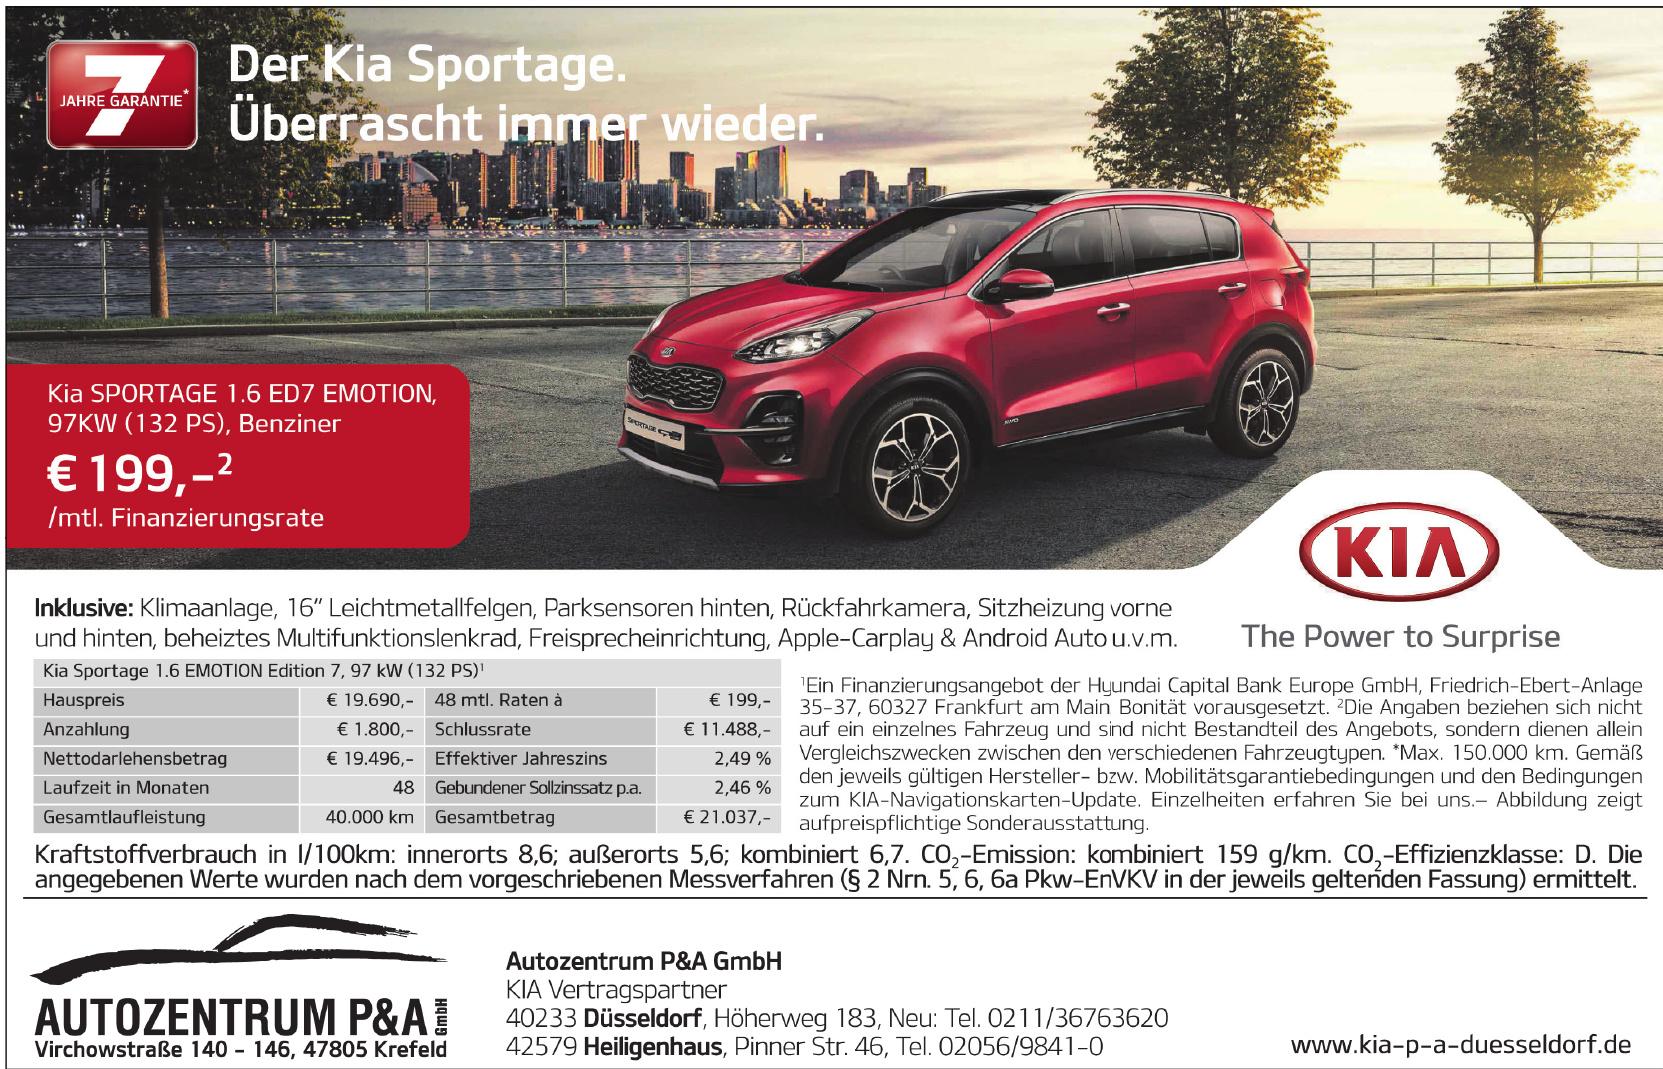 Autozentrum P&A GmbH - KIA Vertragspartner